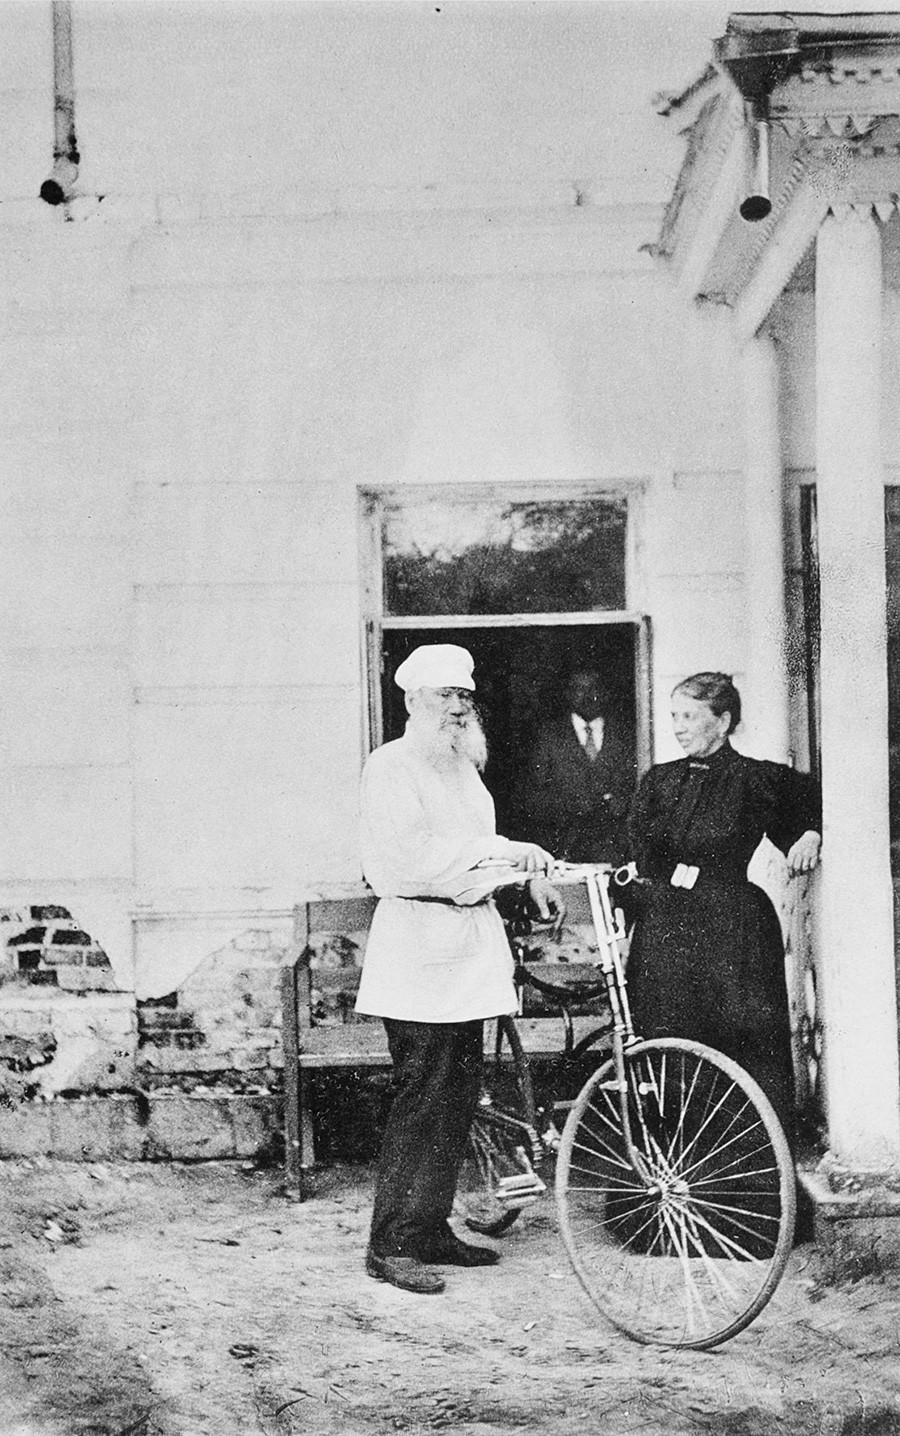 Leo Tolstoy and his wife Sofya Andreyevna in 1890s.